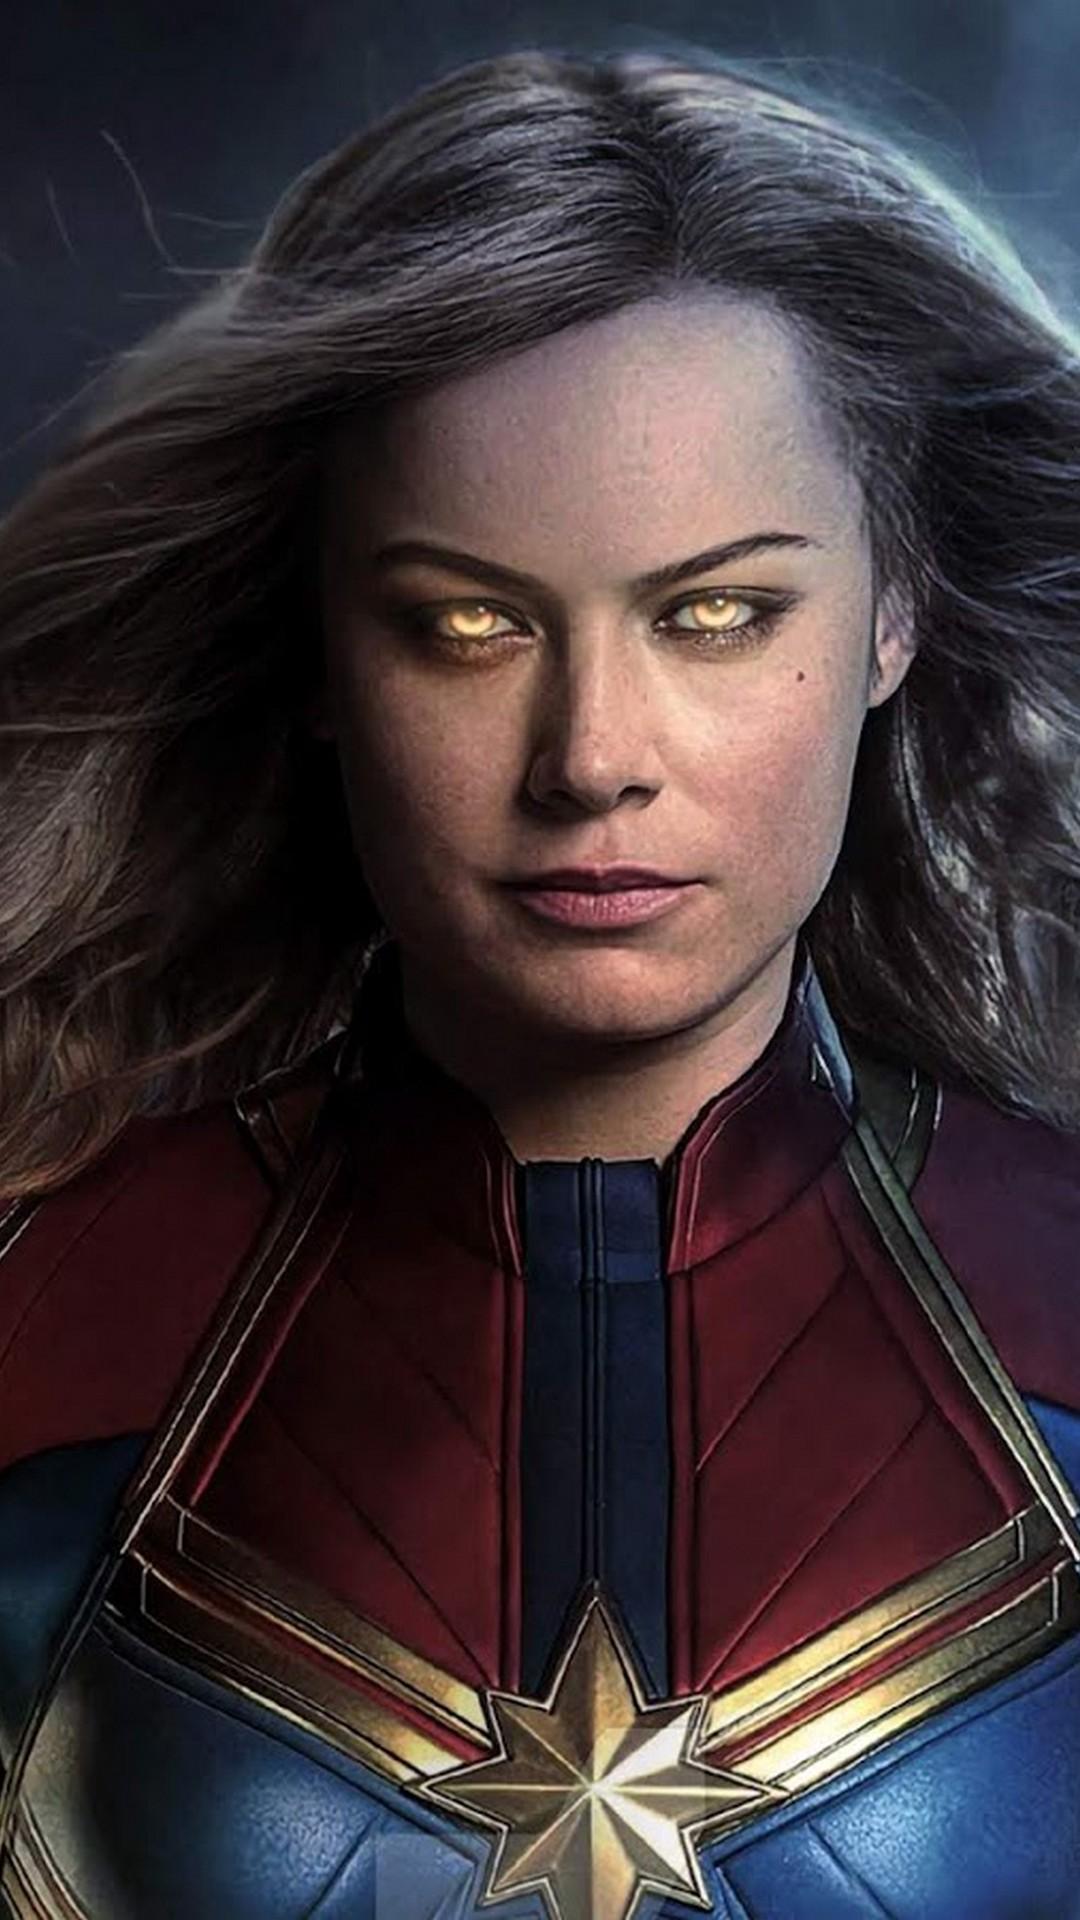 Start Download - Captain Marvel Wallpaper 4k , HD Wallpaper & Backgrounds